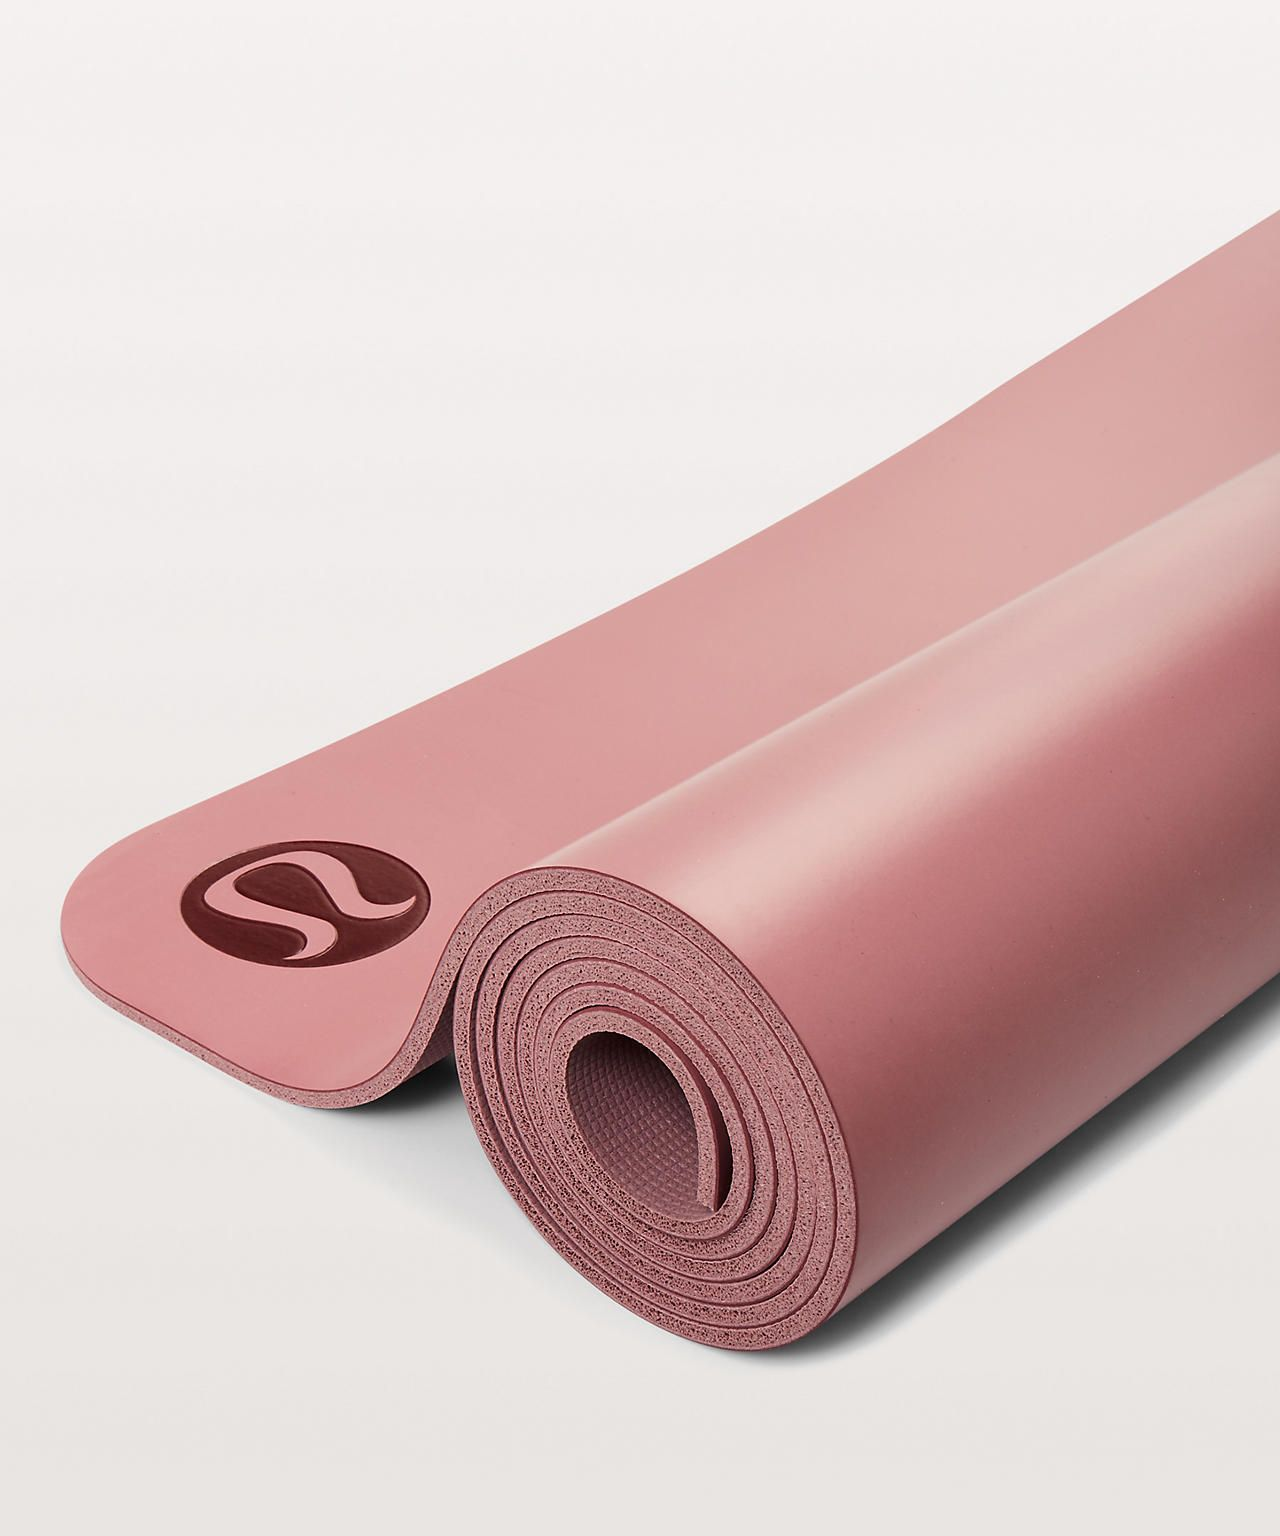 s fitness pink nike mats sp yoga mat fundamental grau mens performance men